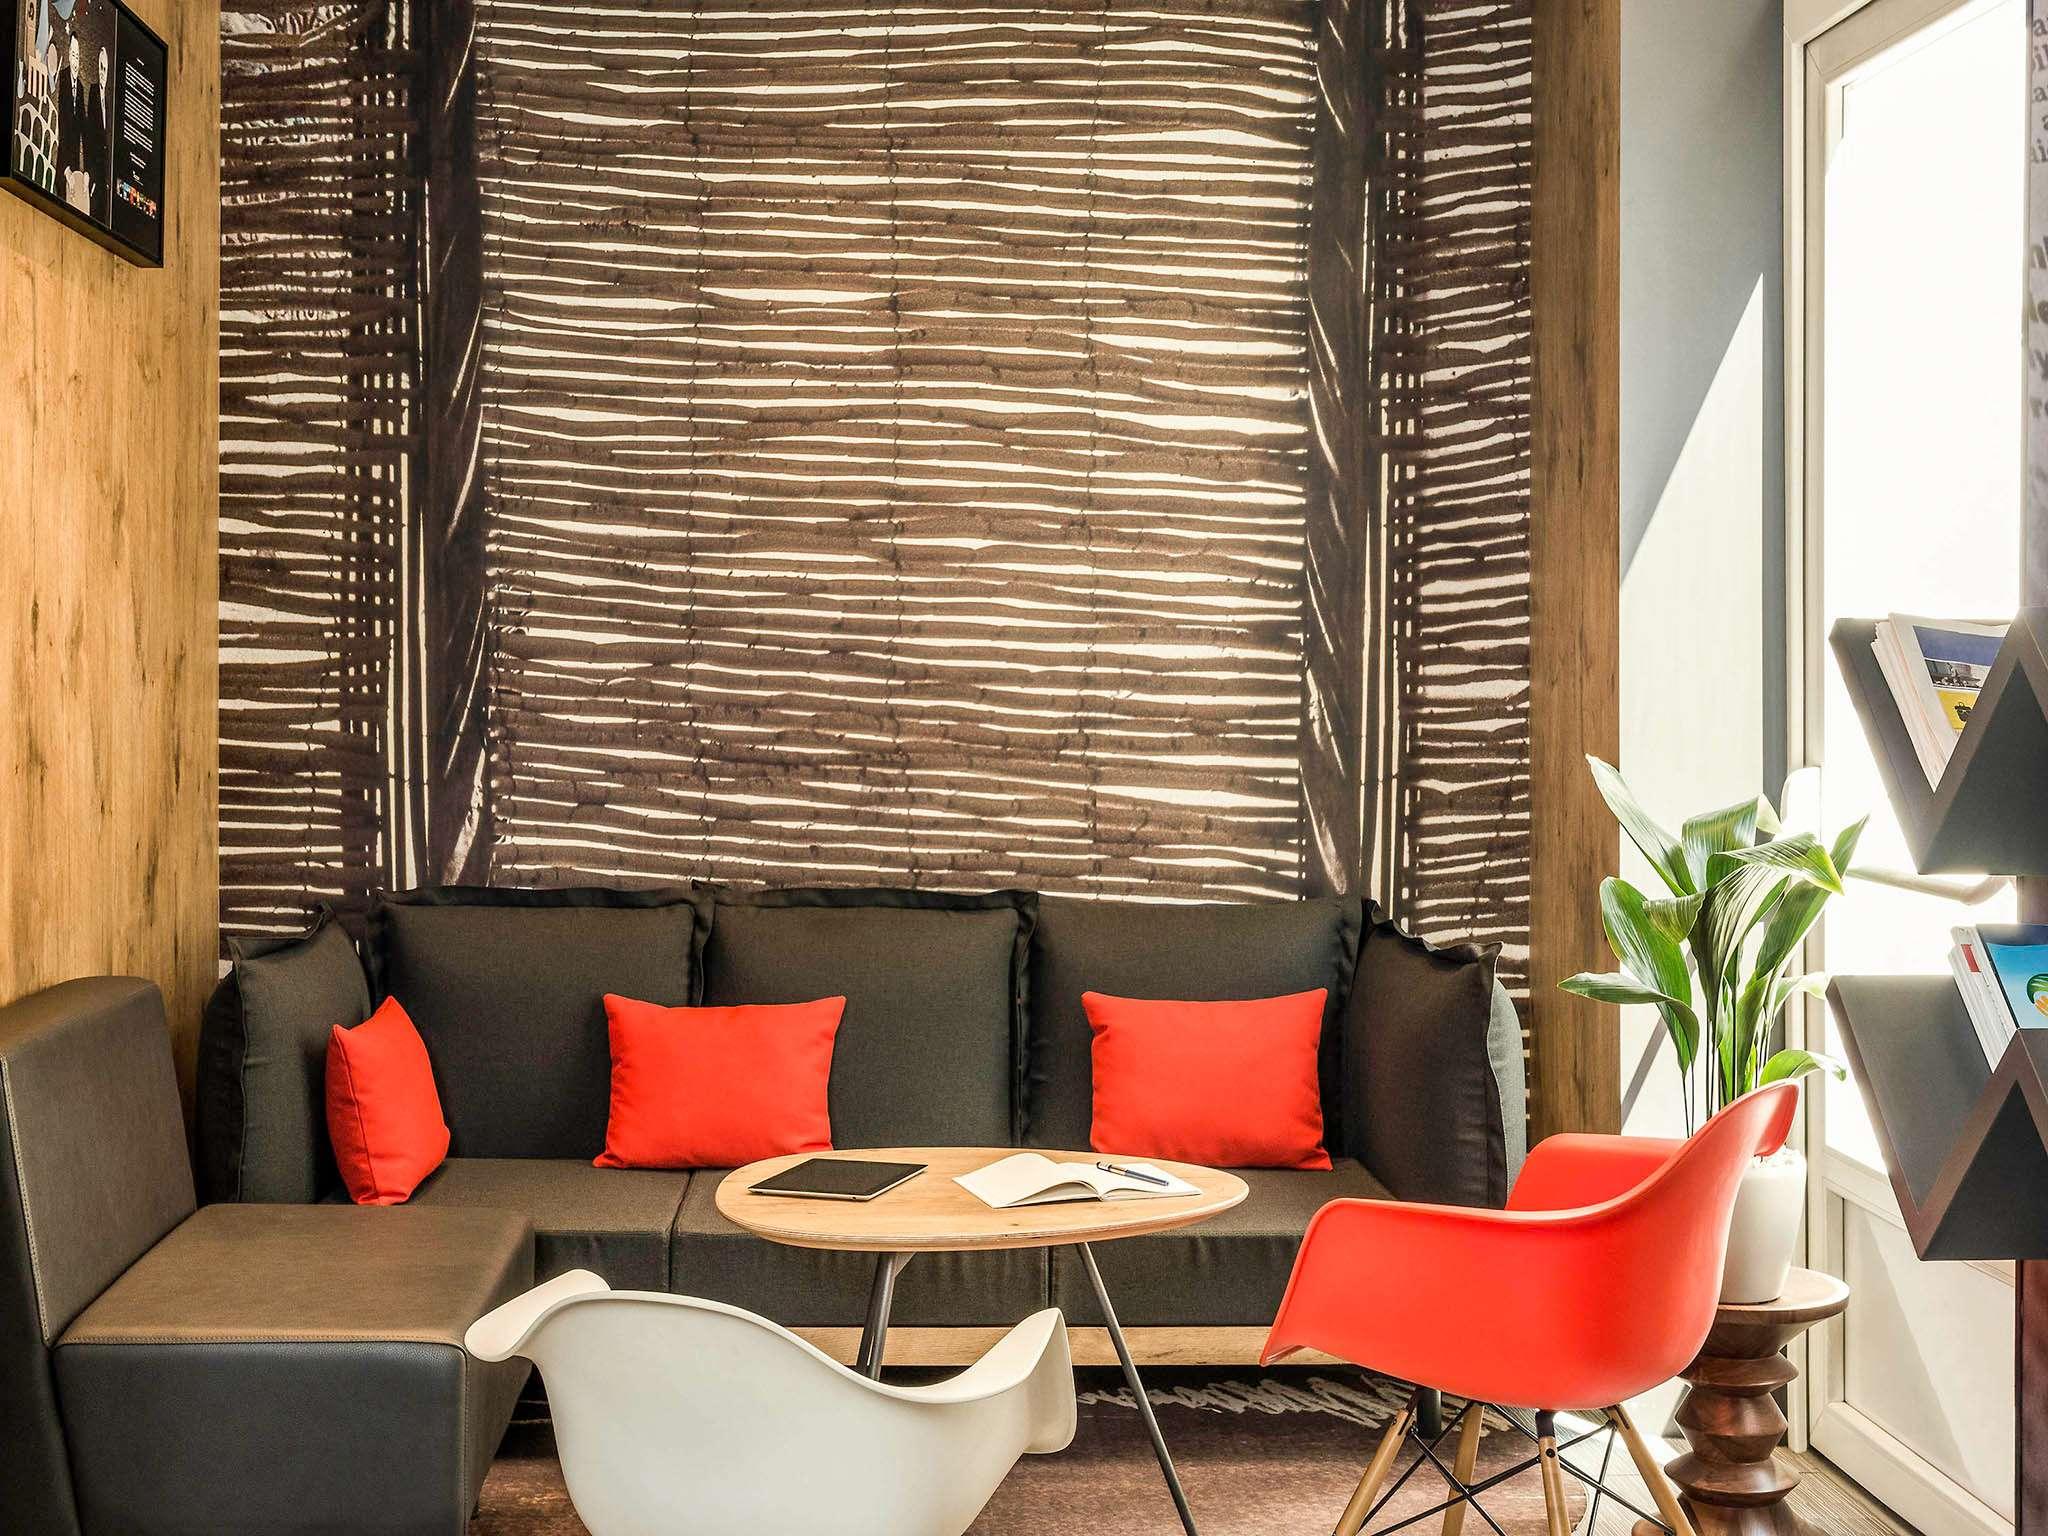 Hotel In Boulogne Billancourt Ibis Paris Boulogne Billancourt